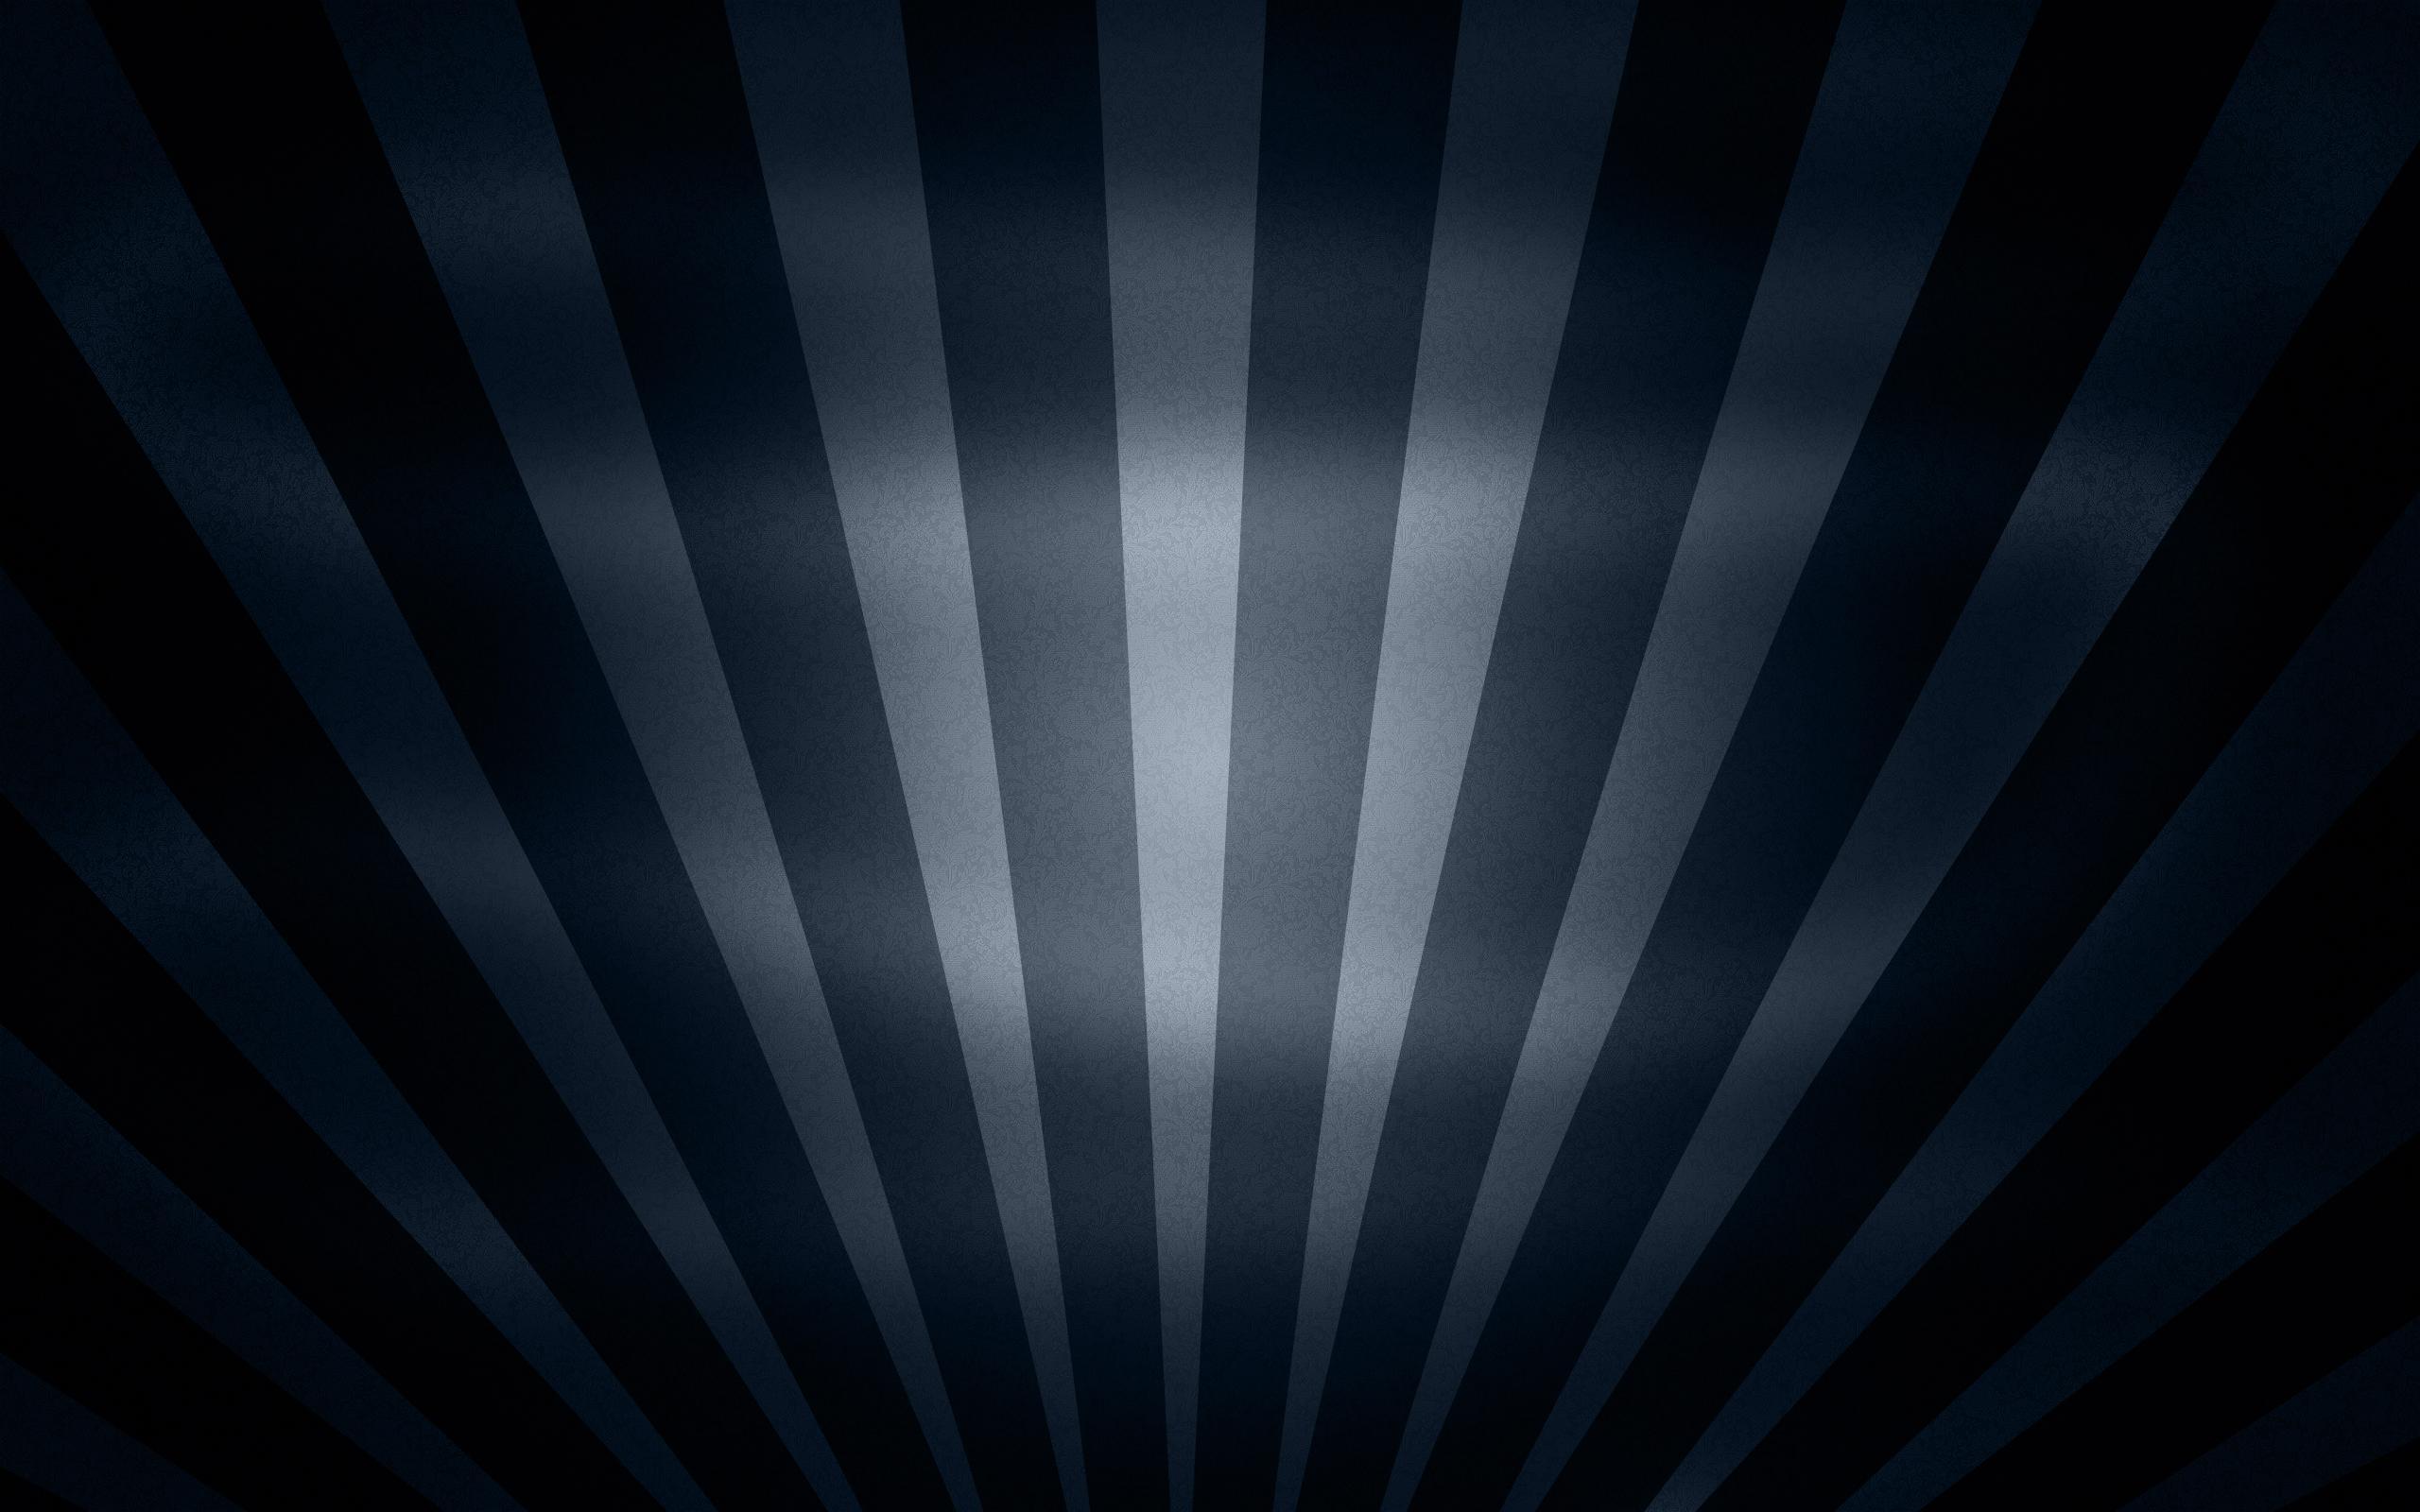 vizyondaki-filmler-bg-1